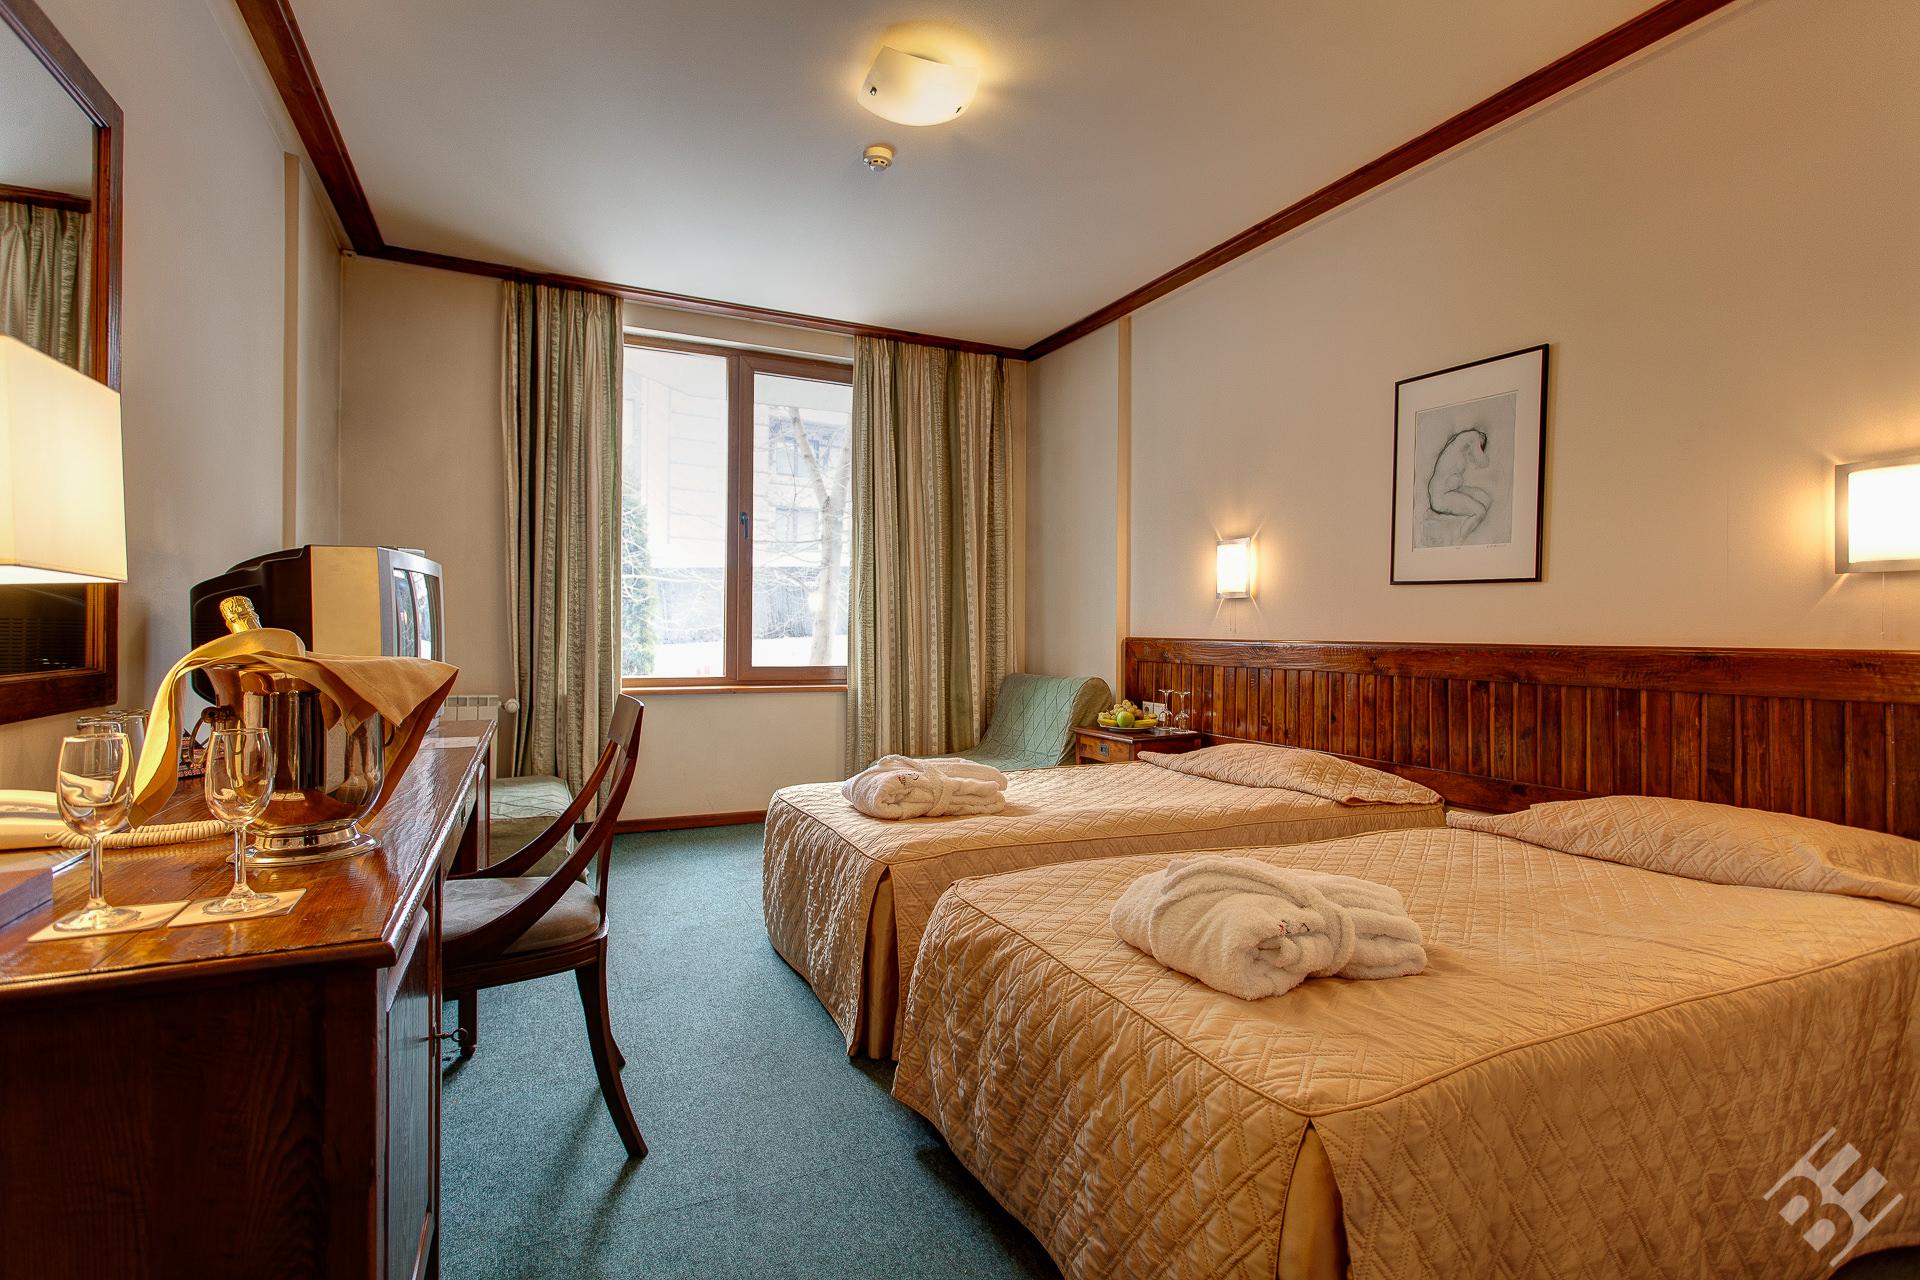 Hotels_11__MG_6989r_Volen_Evtimov